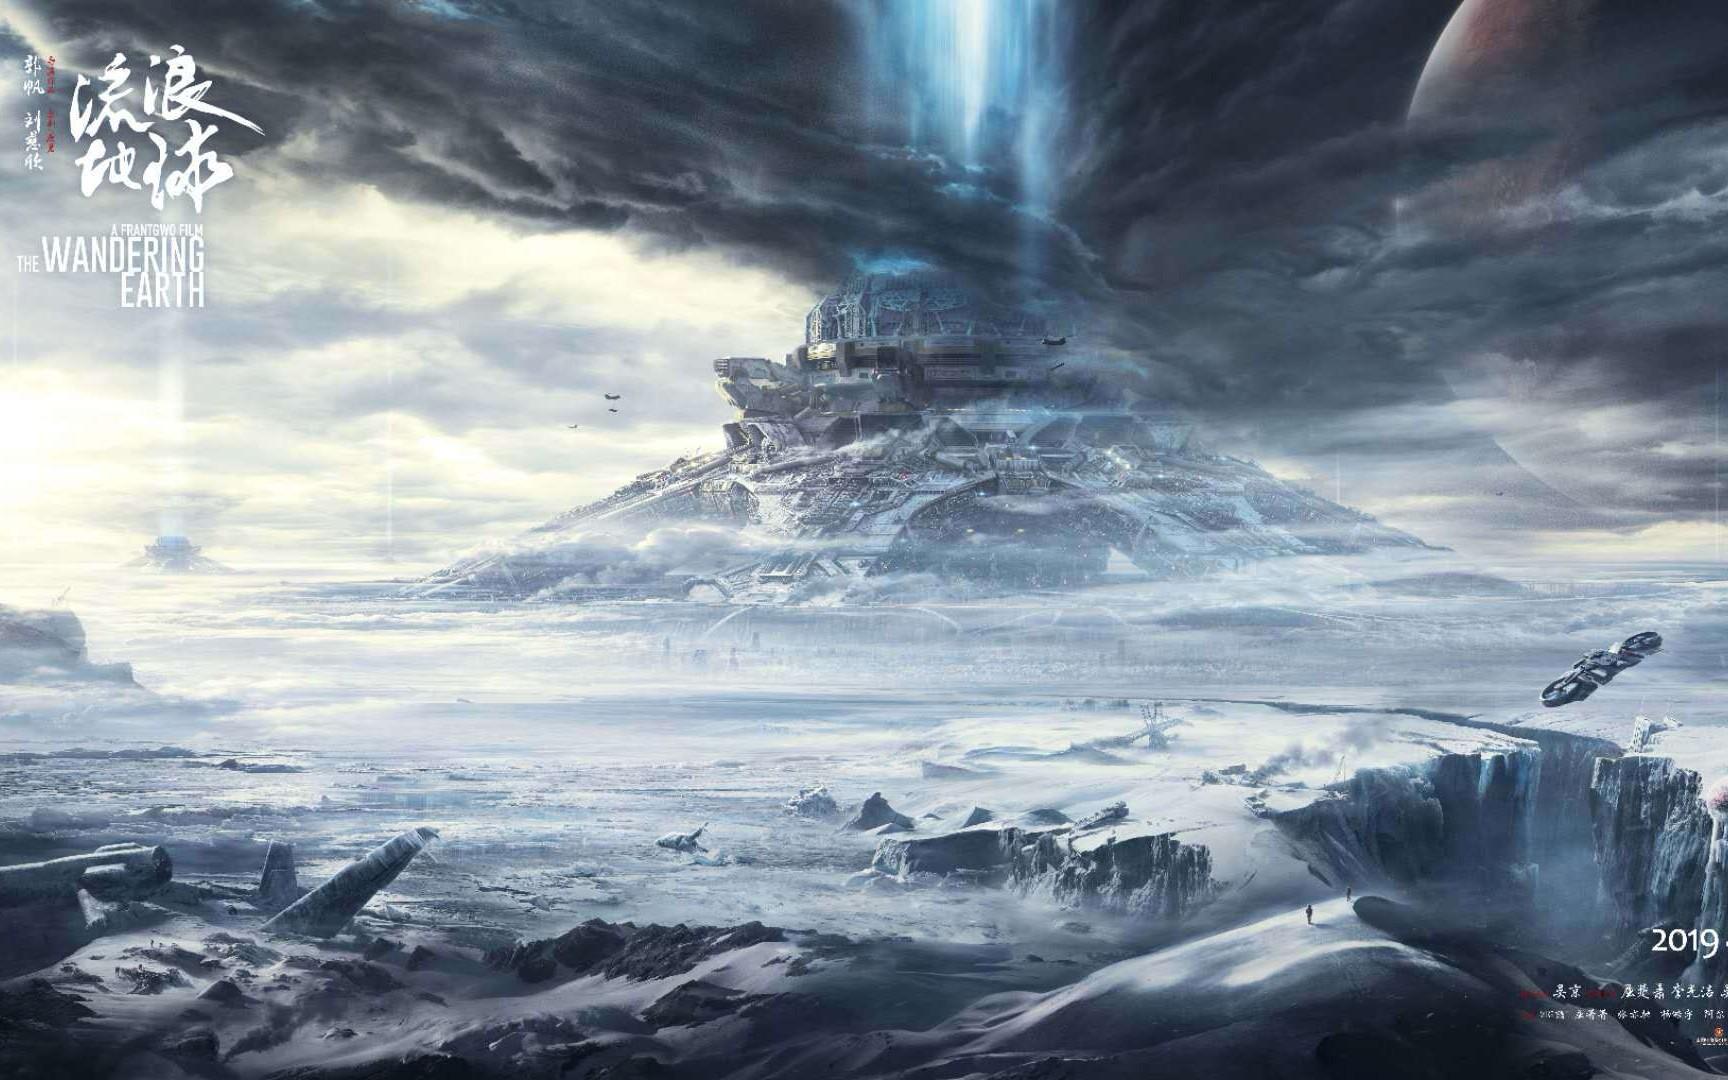 【Guitar Pro】流浪地球-The Wandering Earth Main Theme-扒谱+改编